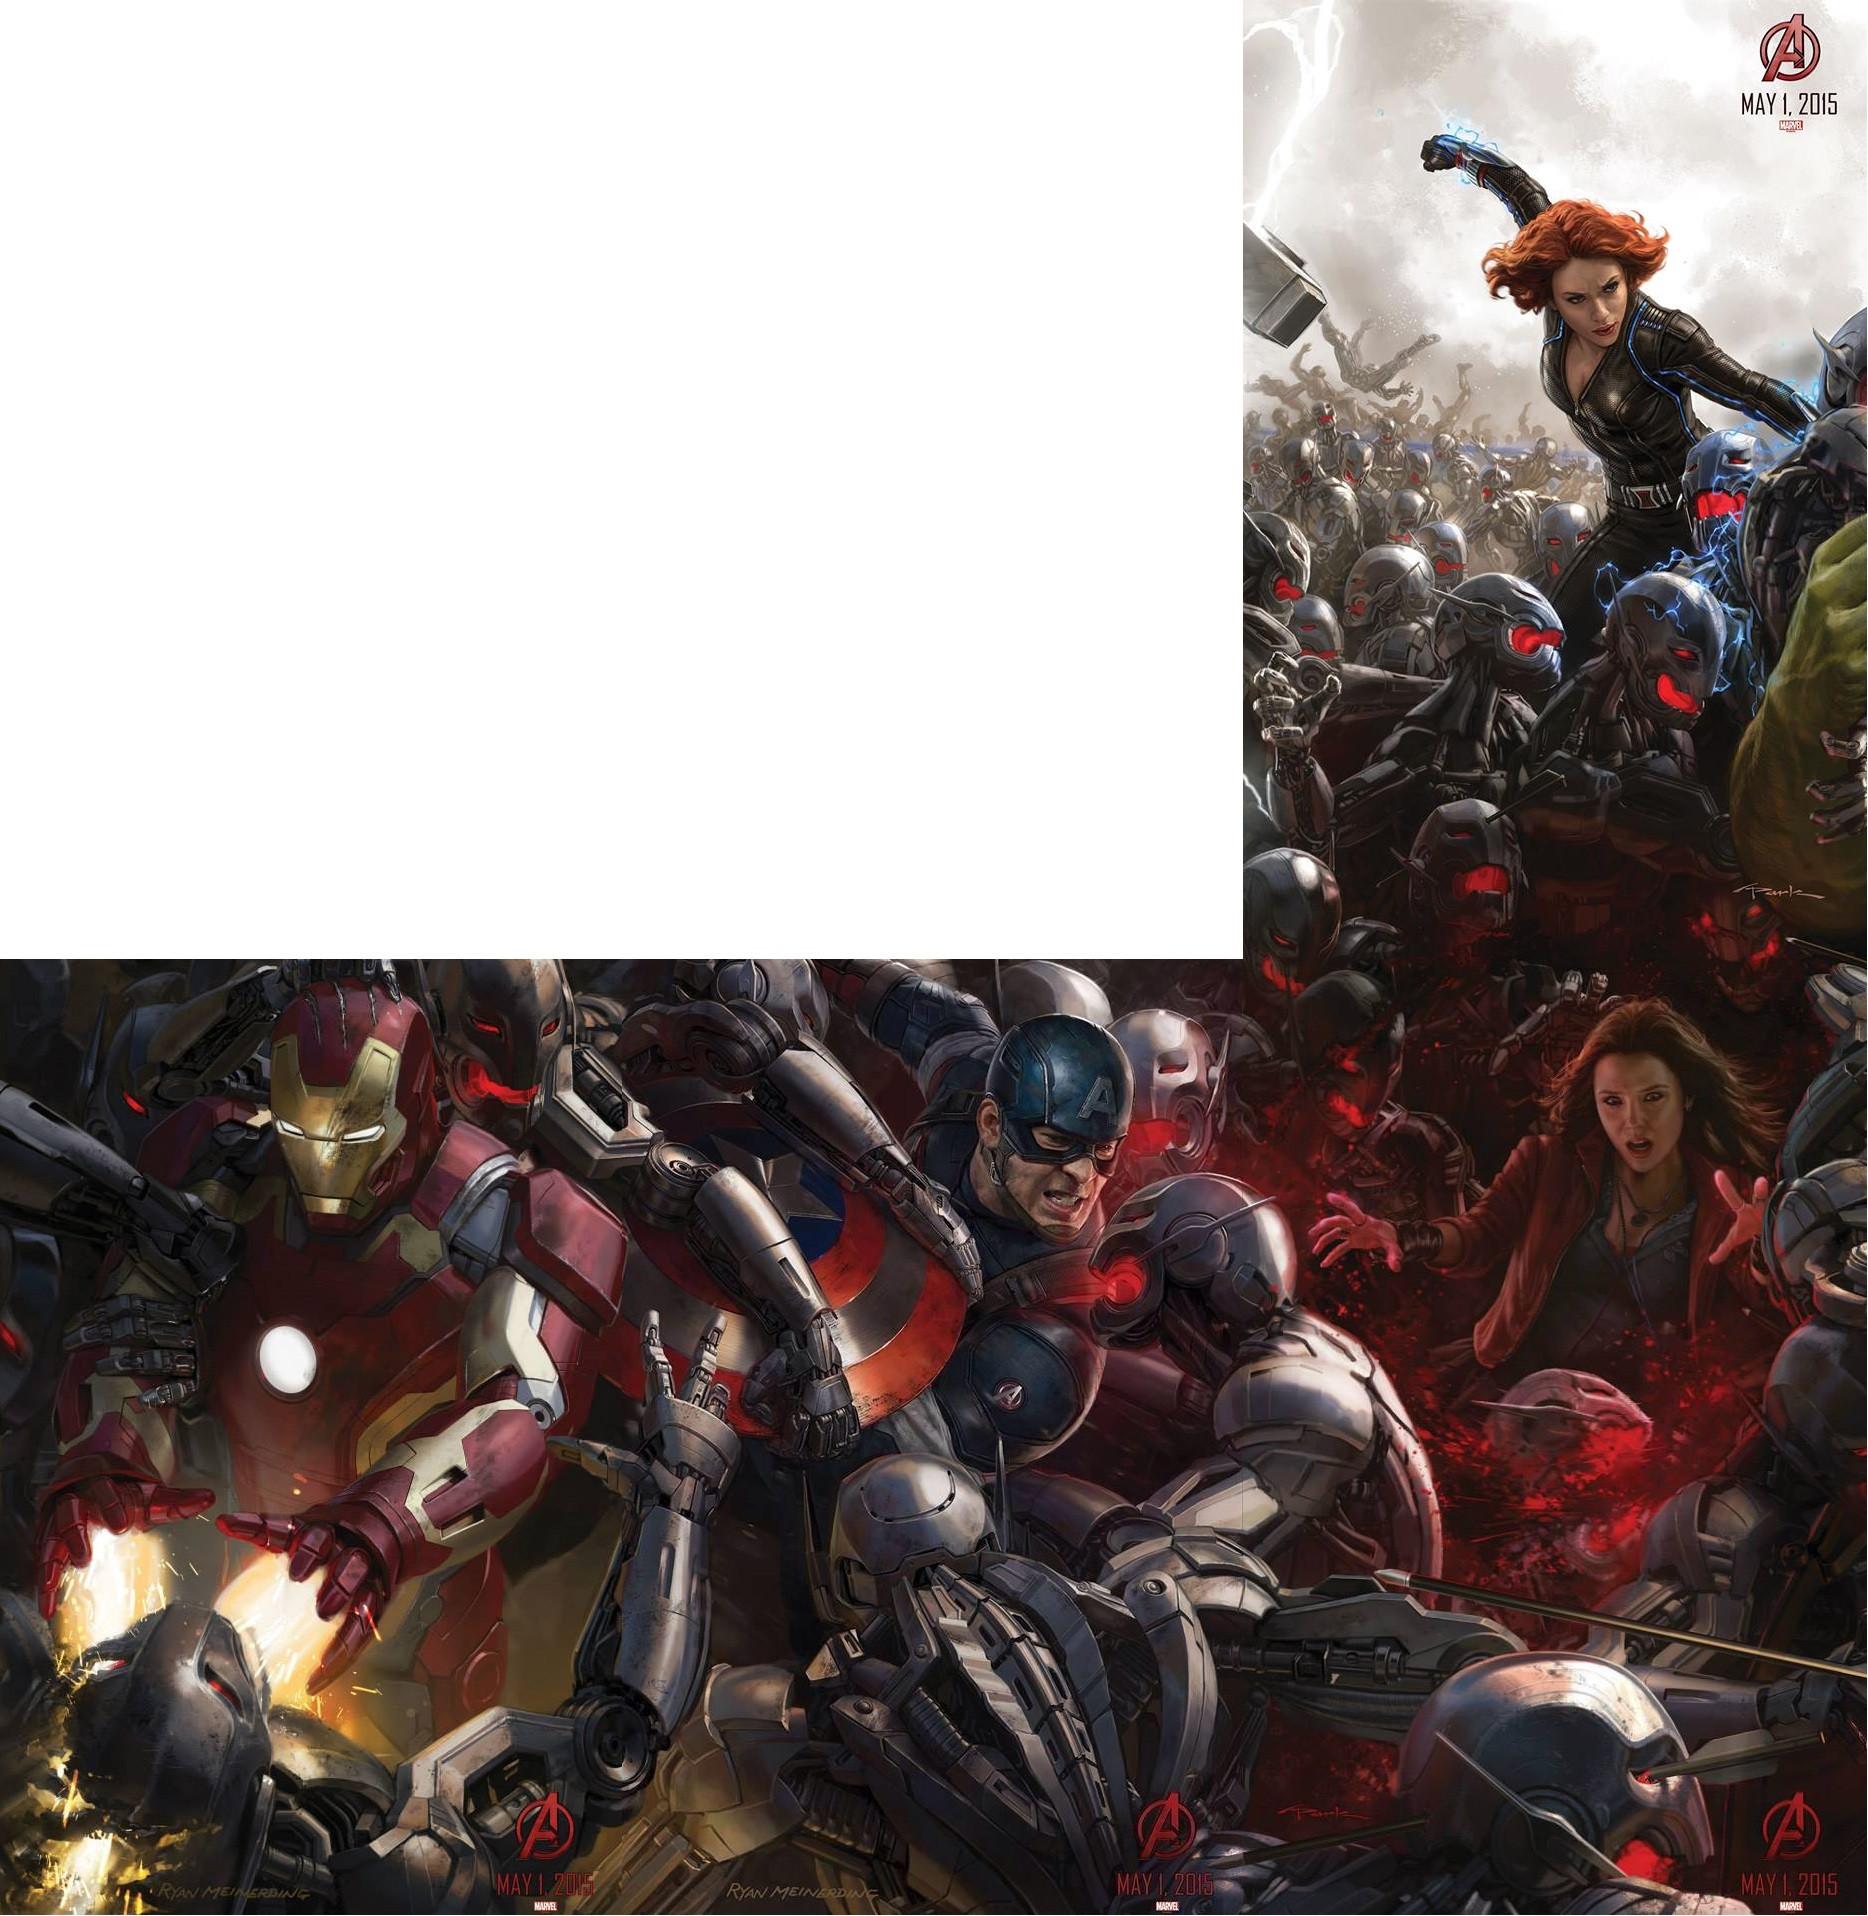 Black Widow Age Ultron: Avengers Age Of Ultron Black Widow Poster